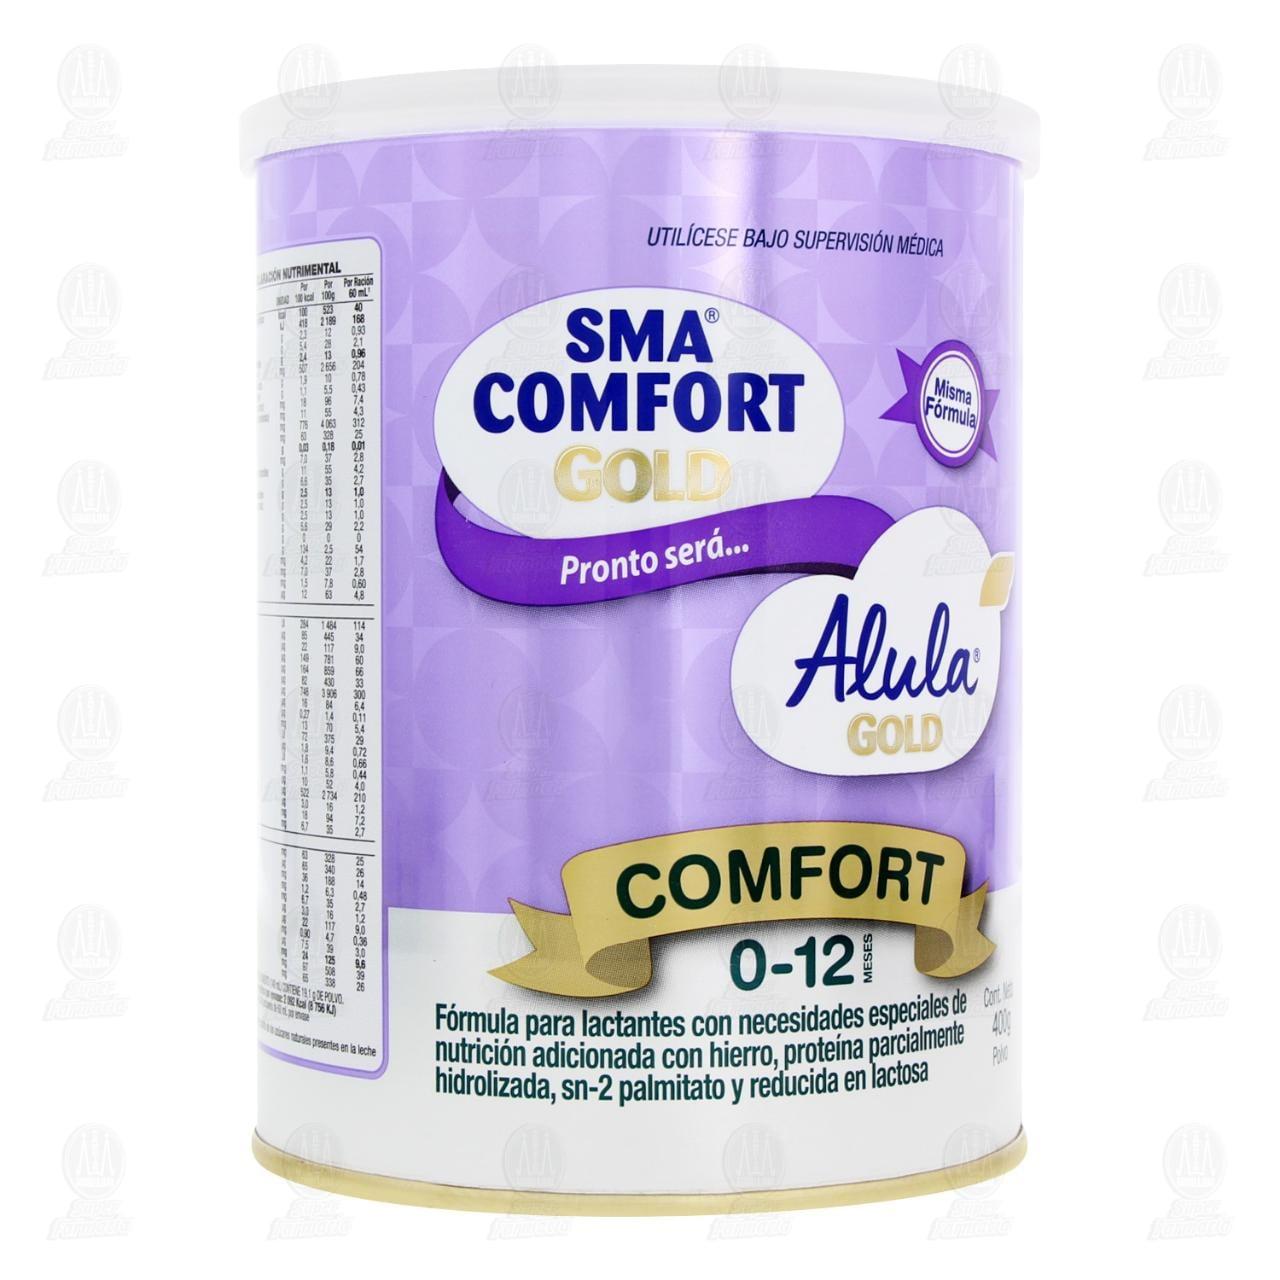 Comprar Fórmula Infantil SMA Comfort Gold en Polvo (Edad 0-12 Meses), 400 gr. en Farmacias Guadalajara